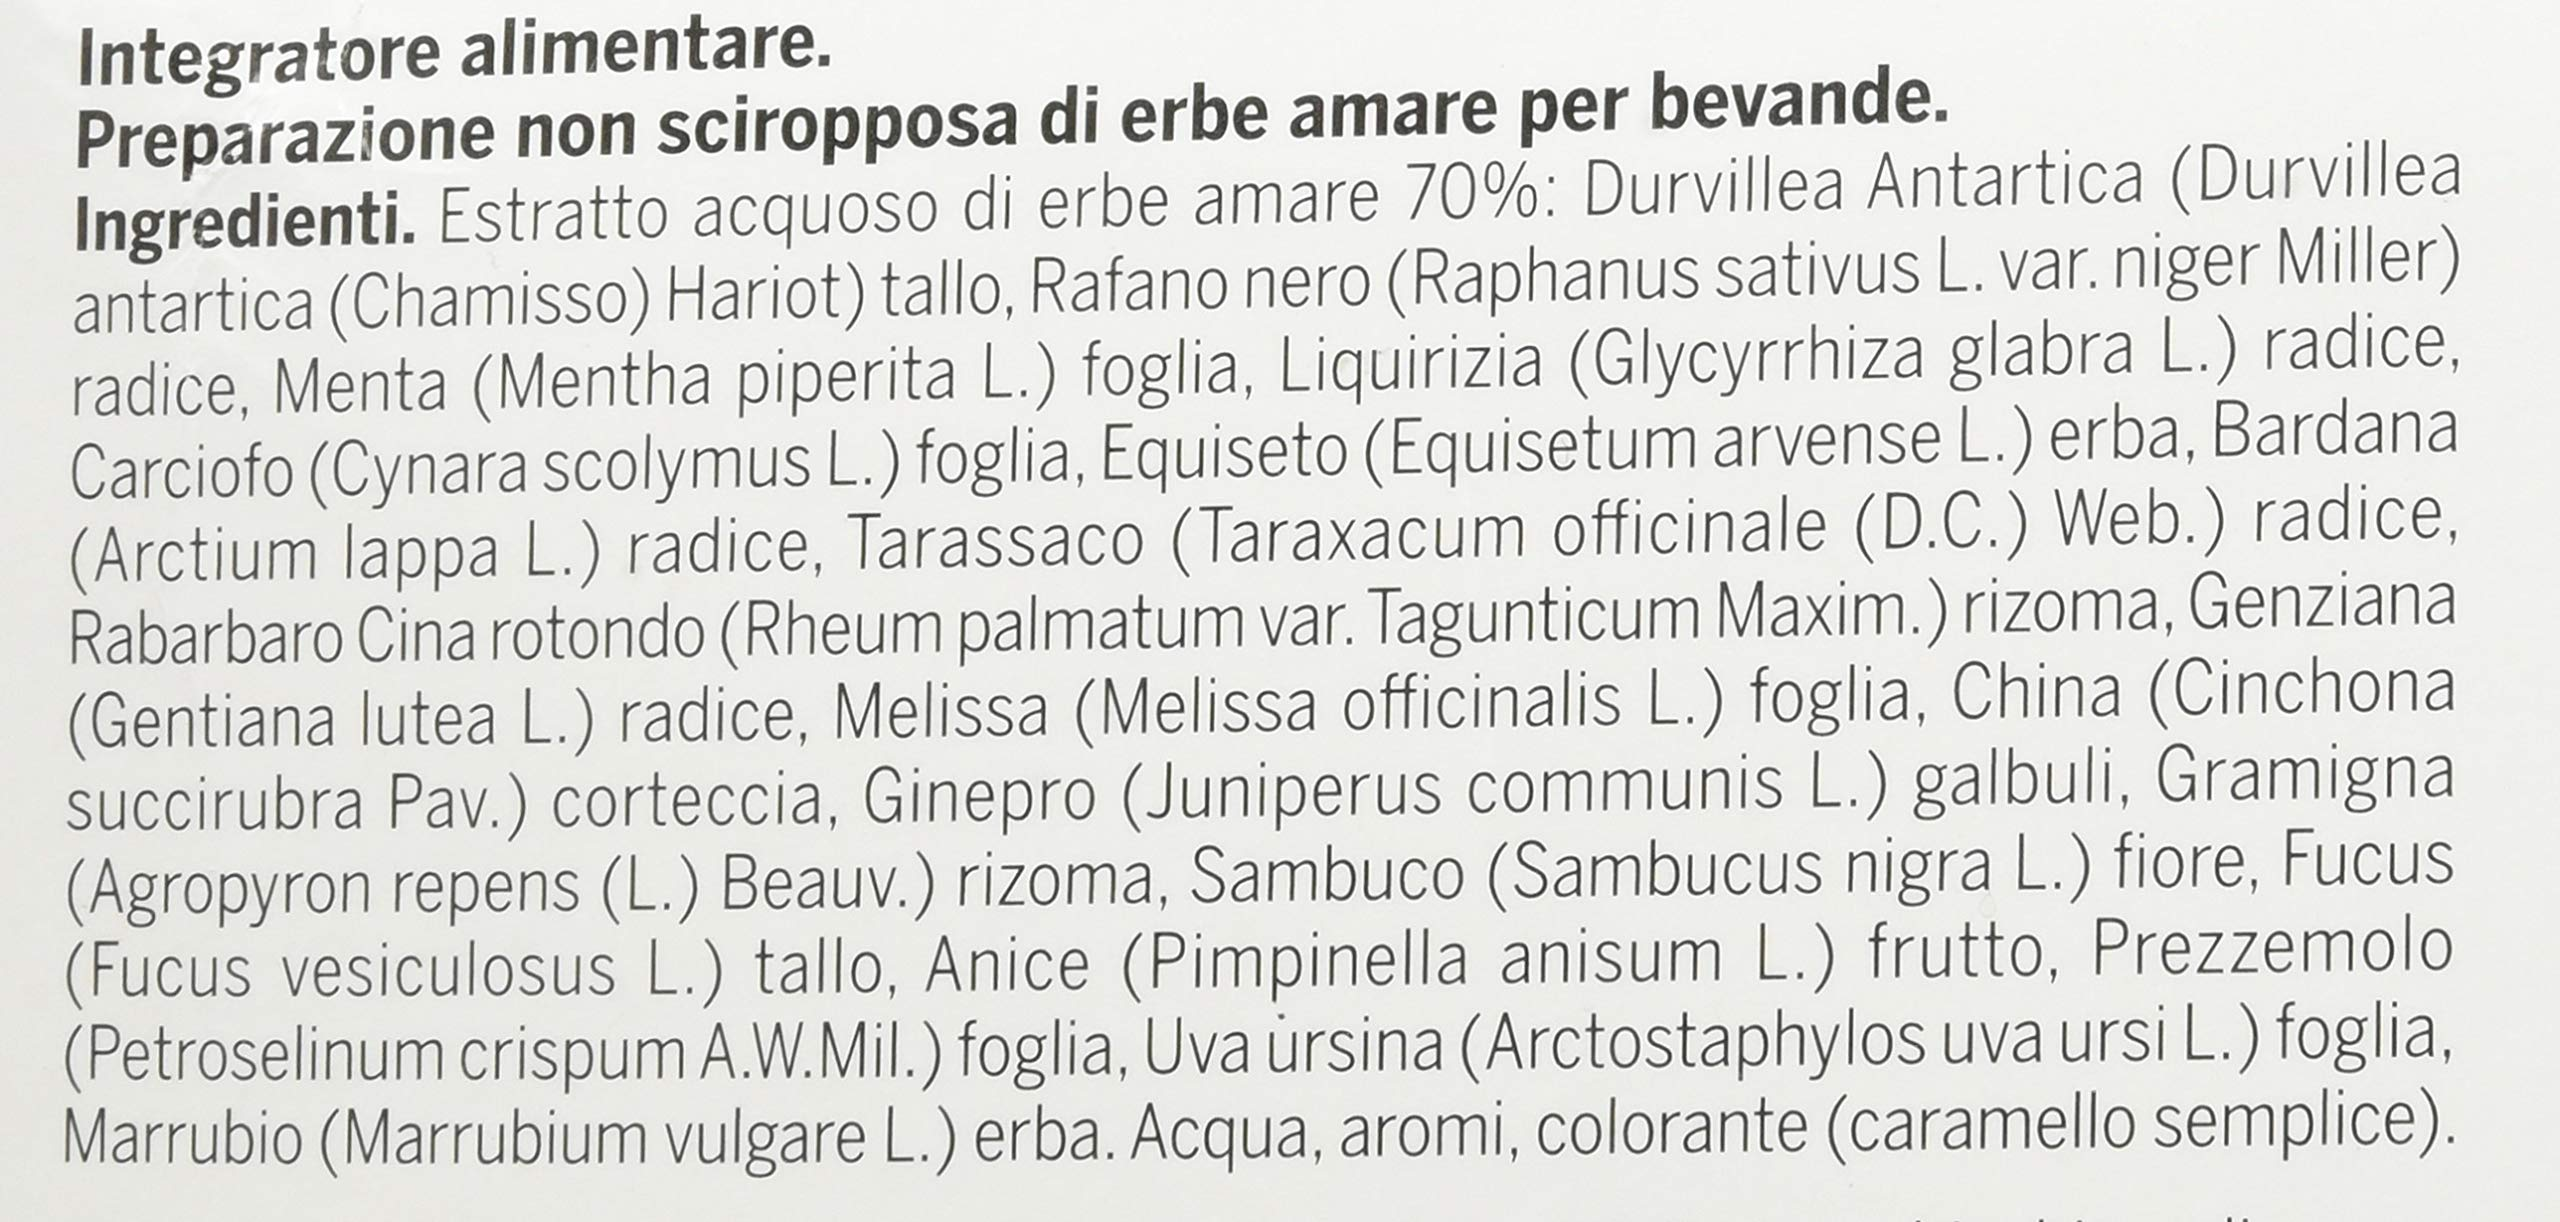 Gianluca Mech - Depurativo Antartico, Diuretico Secondo il Metodo Decottopia in Formato Decopocket - 16 Stick da 30 ml 2 spesavip